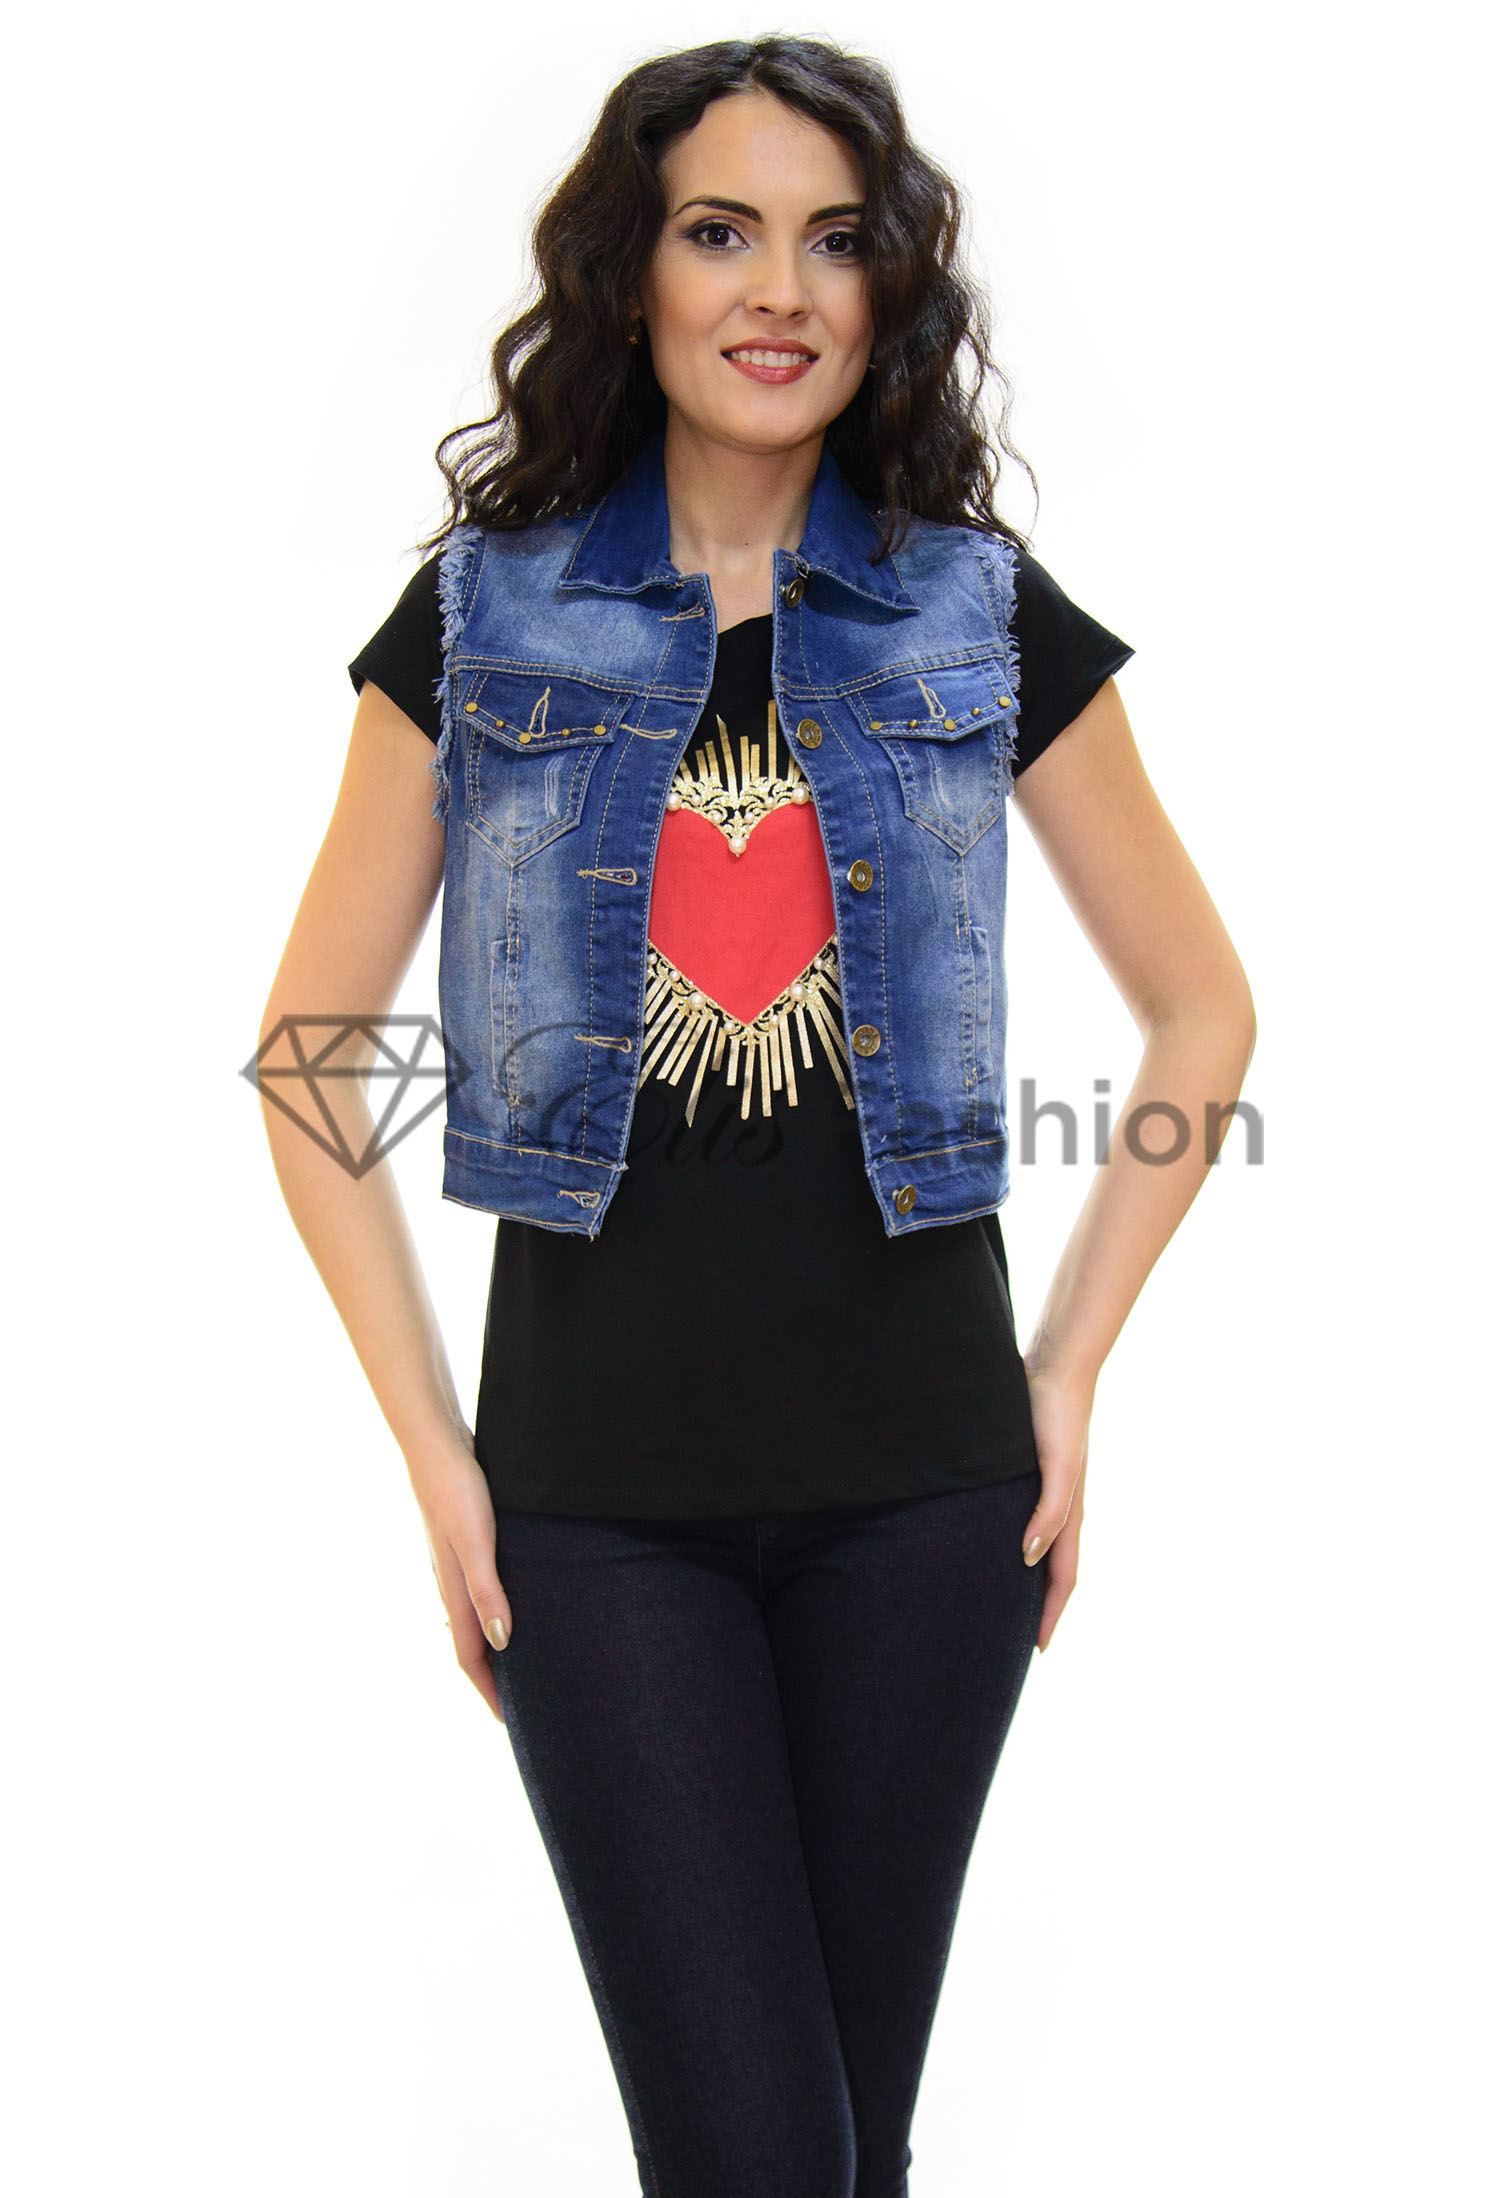 Vesta Top Knot Jeans